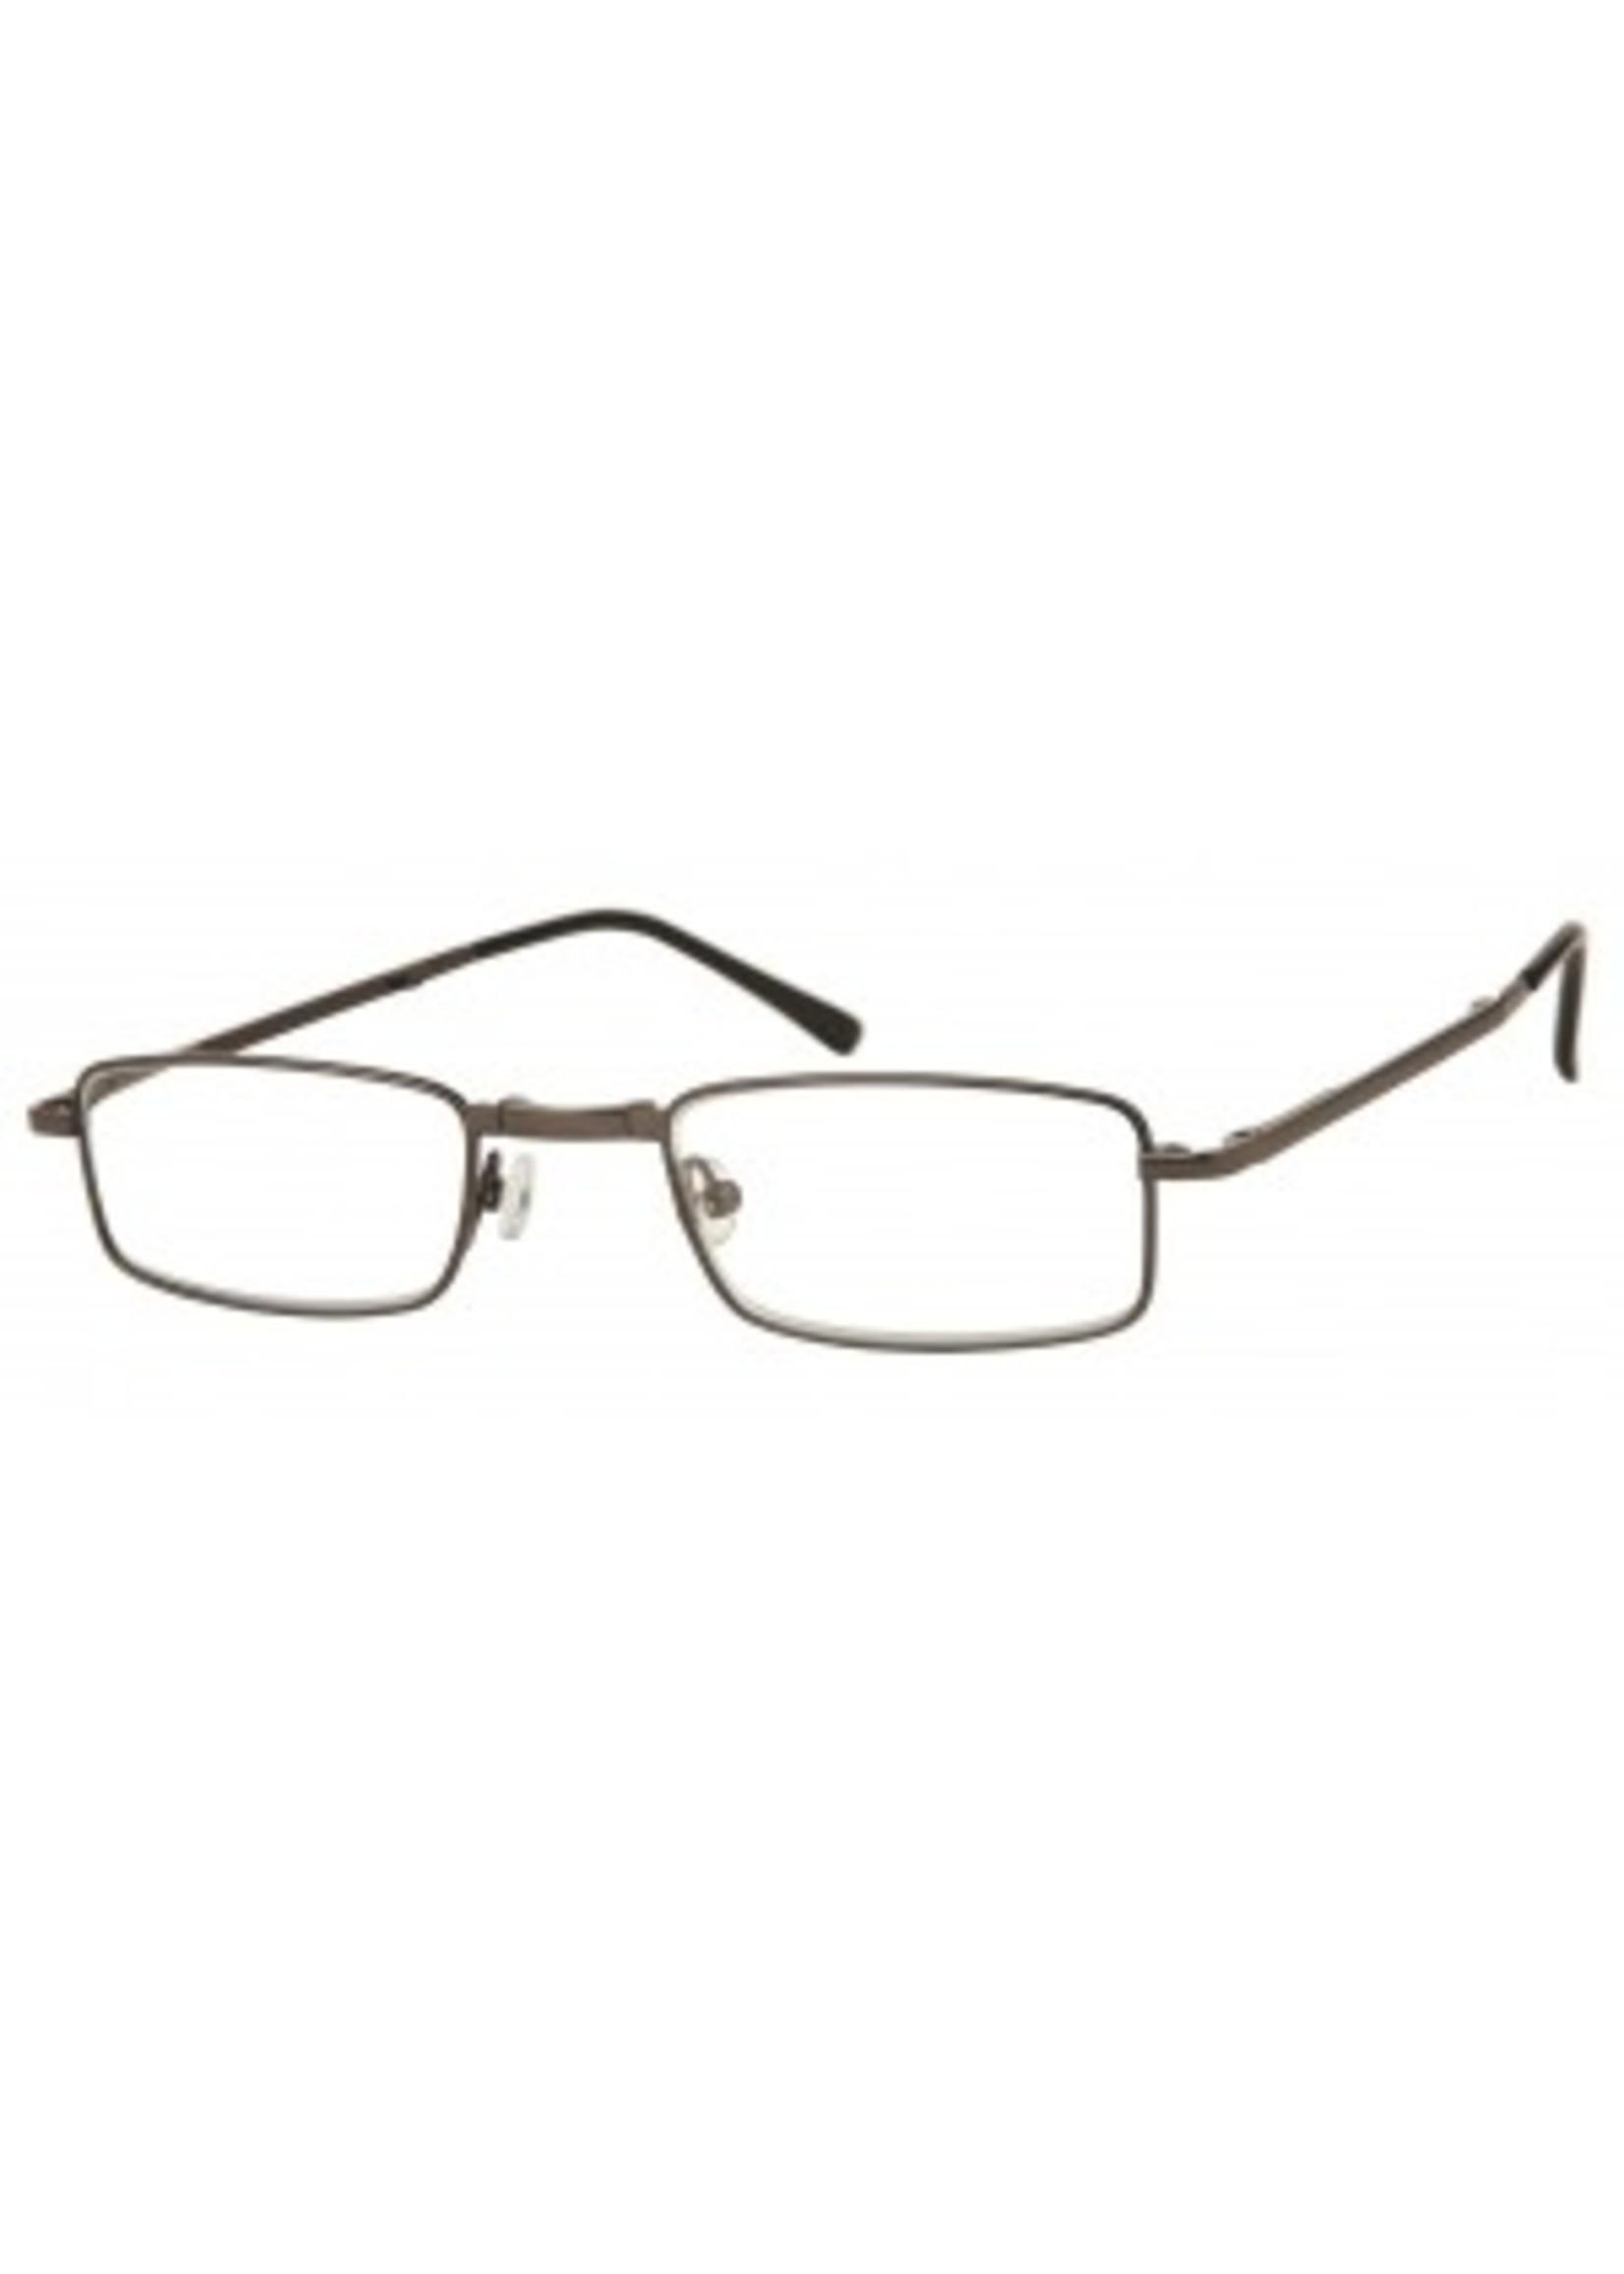 Opvouwbare leesbril in gunkleur